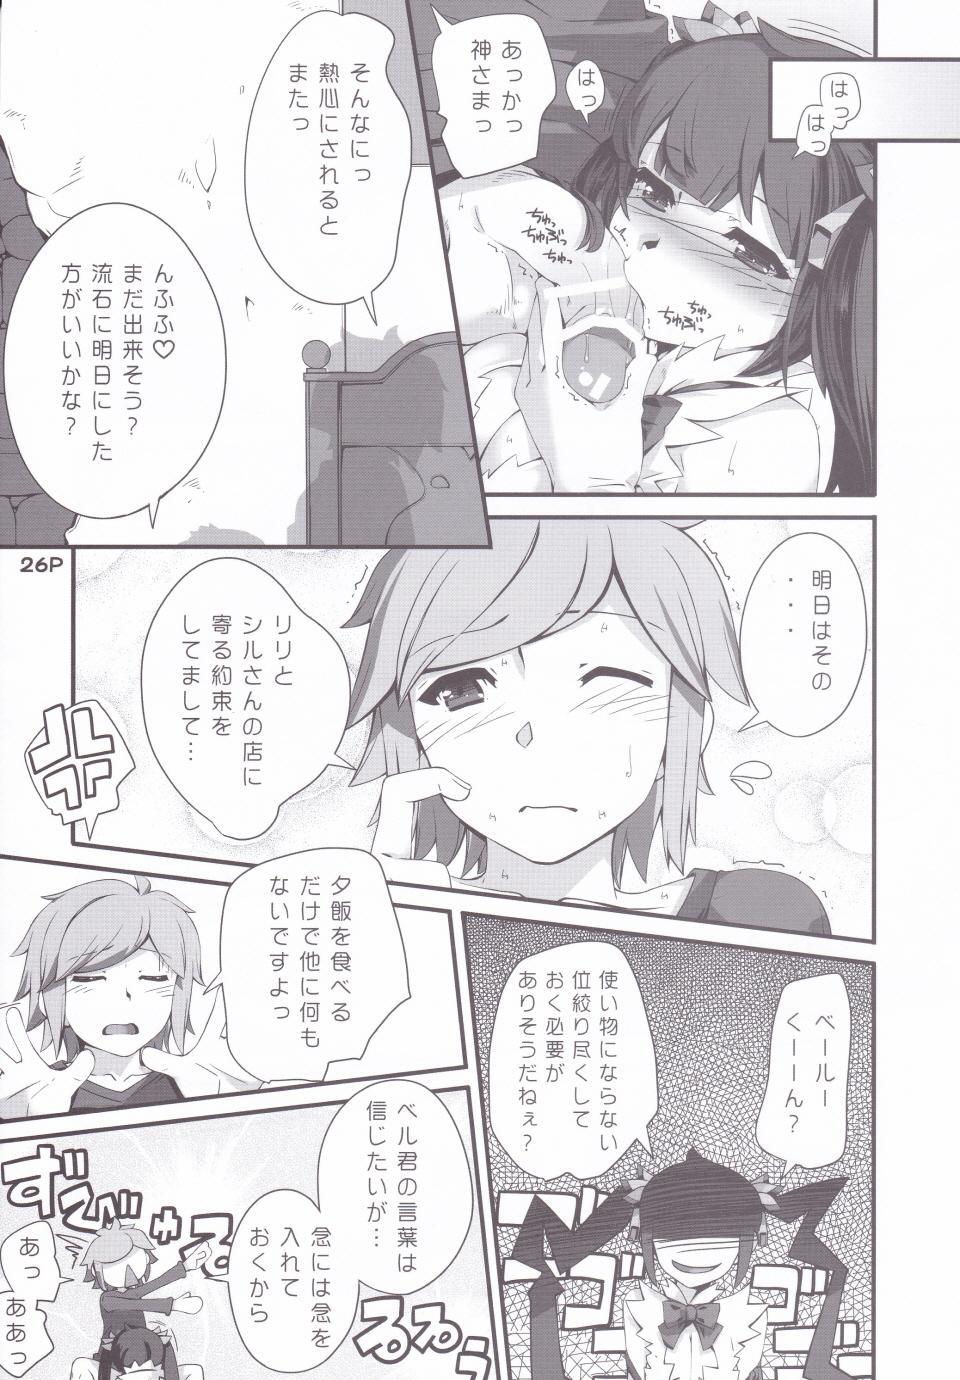 Kamisamano Iu Toori 26